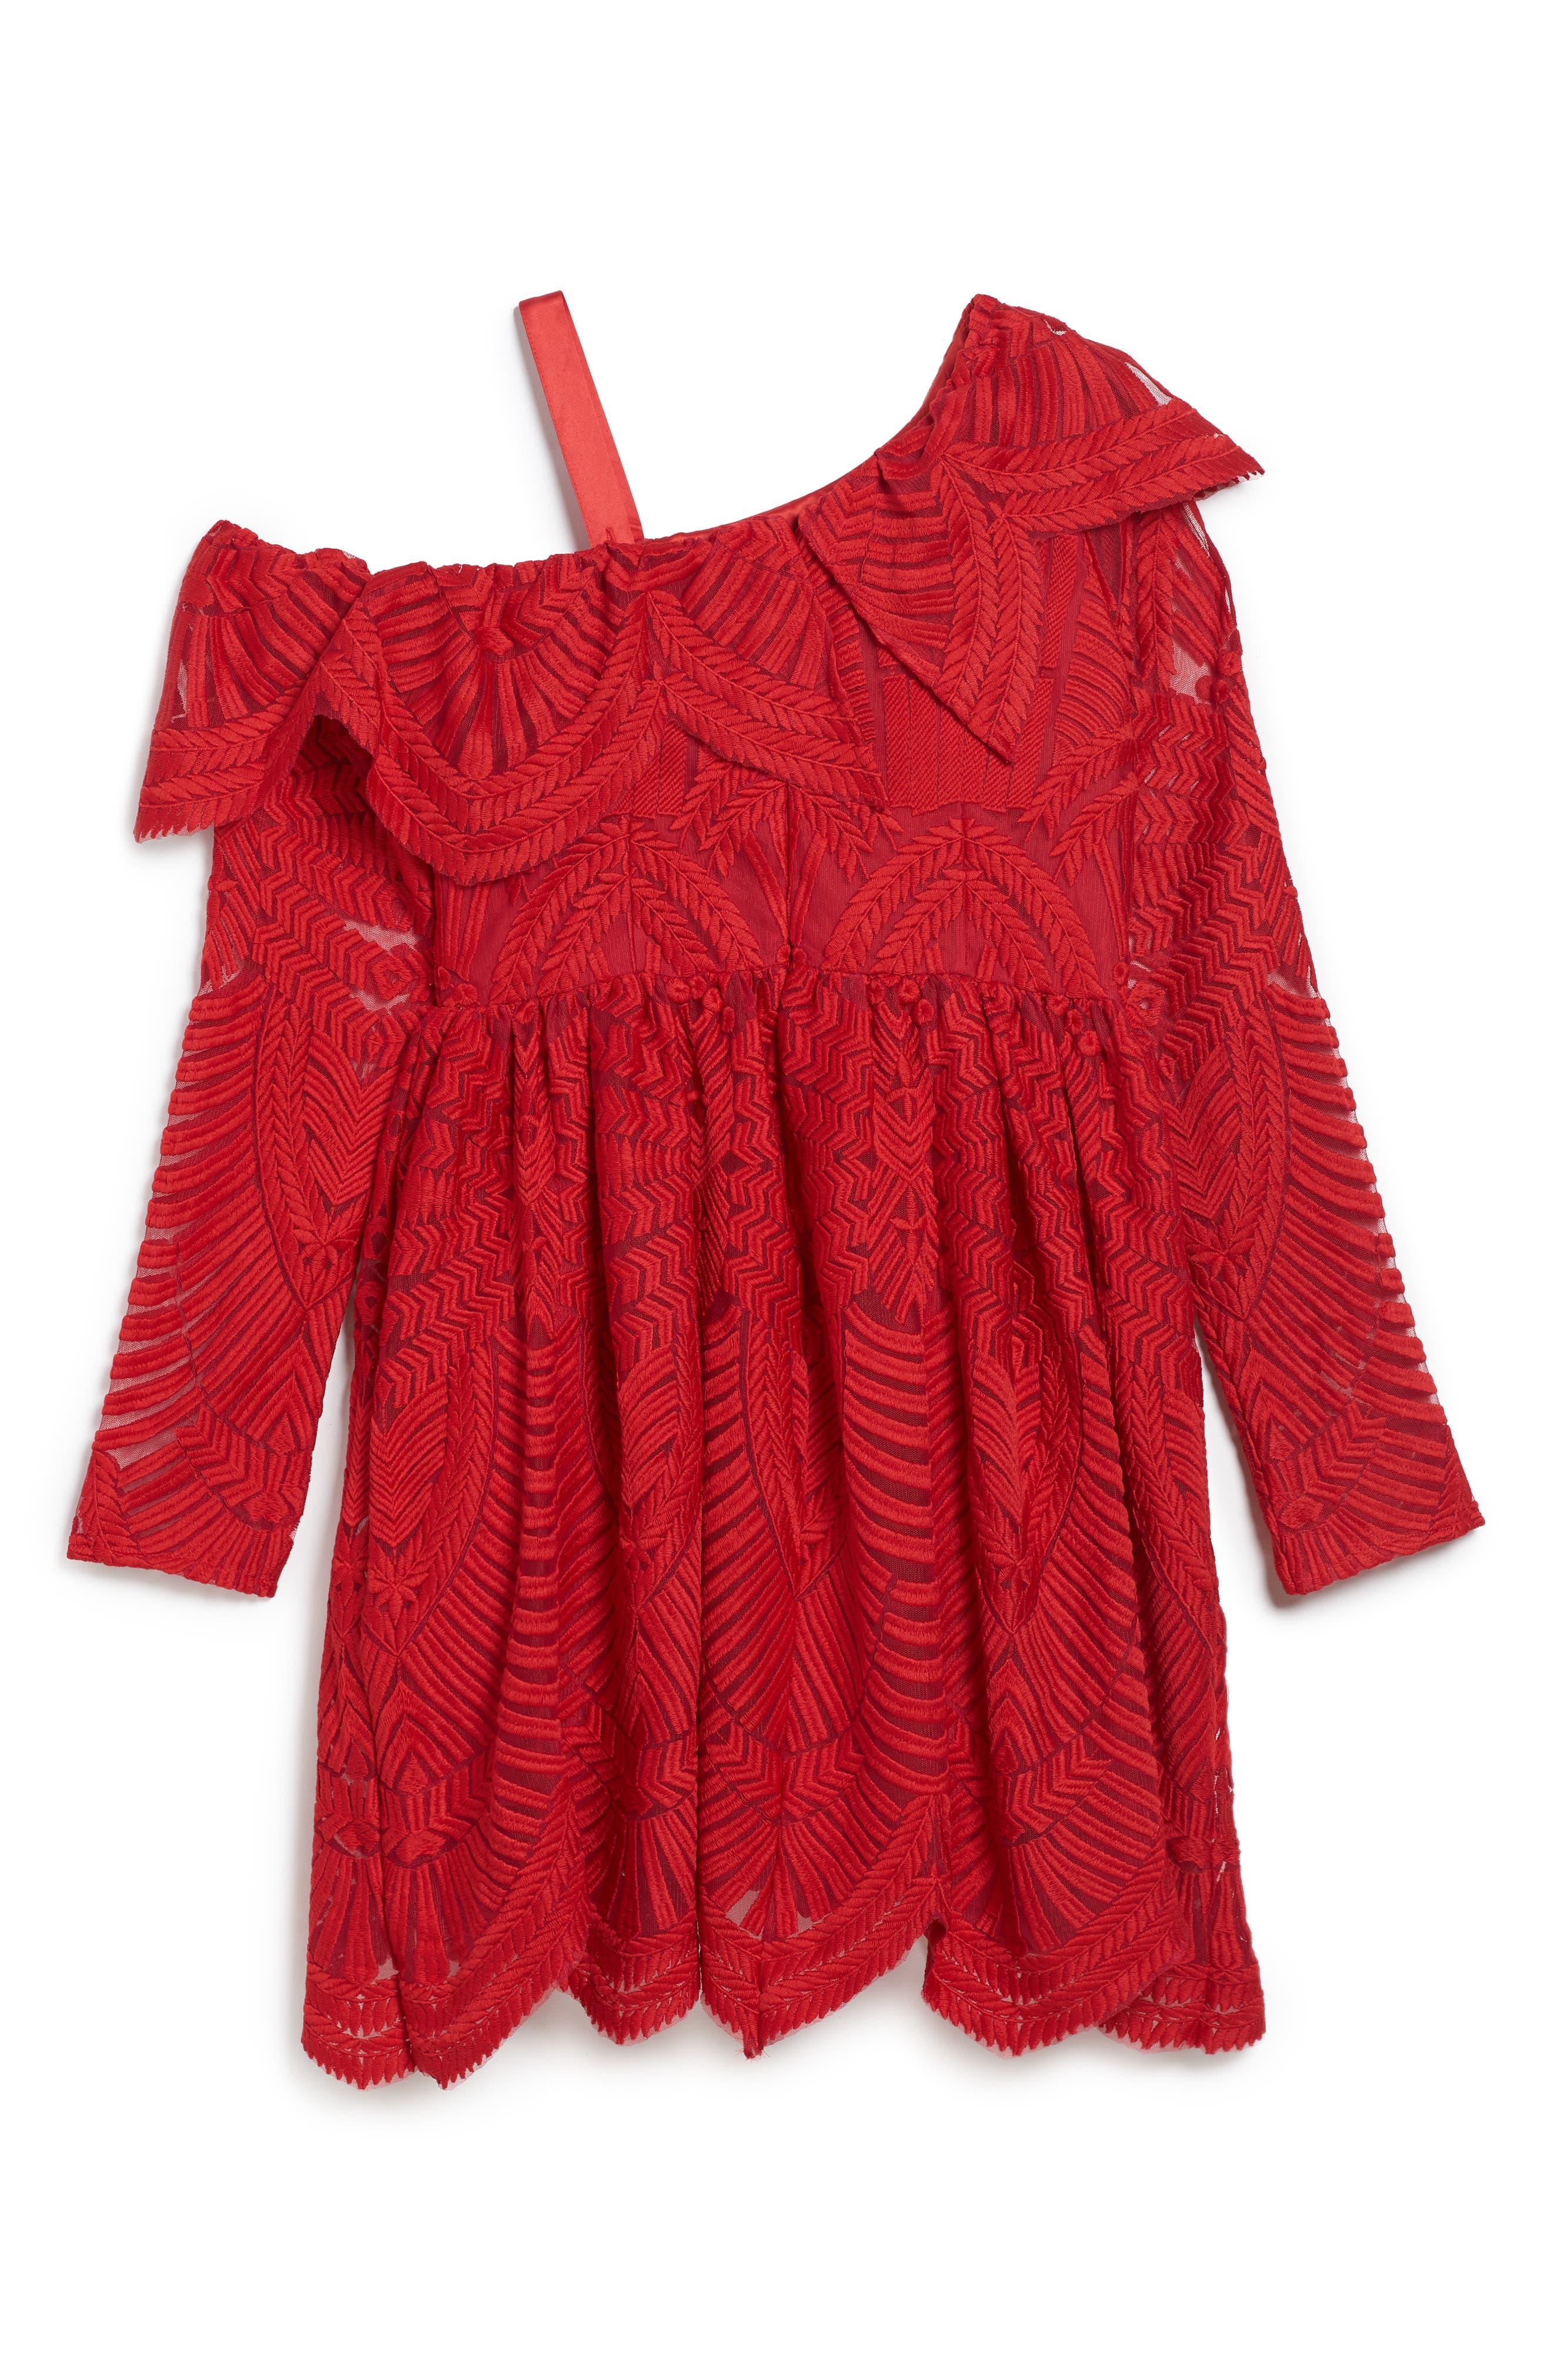 Sybil Lace Dress,                             Alternate thumbnail 2, color,                             Red